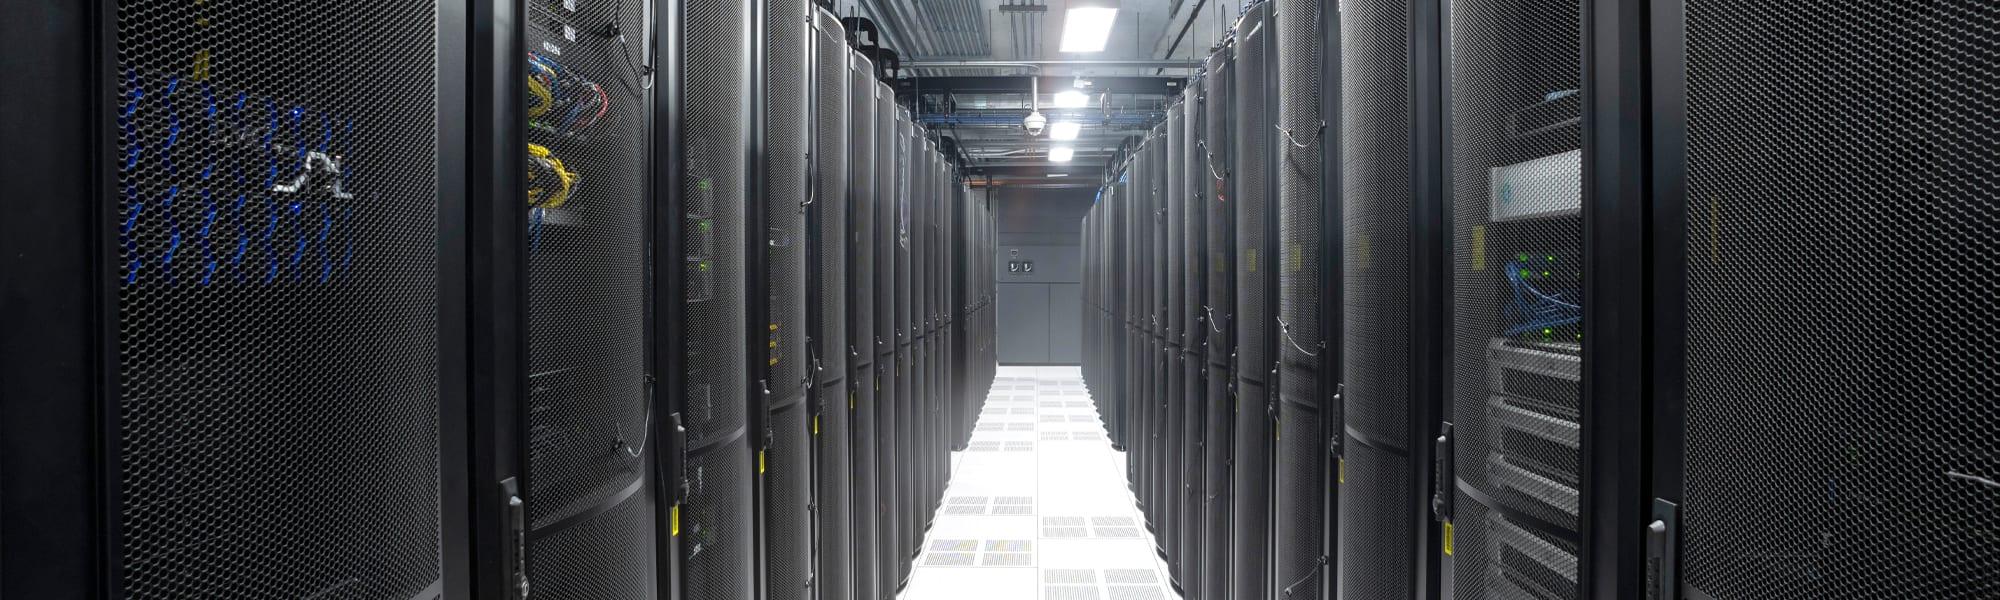 SubTropolis Technology Center is a purpose-built data center campus located in Kansas City.